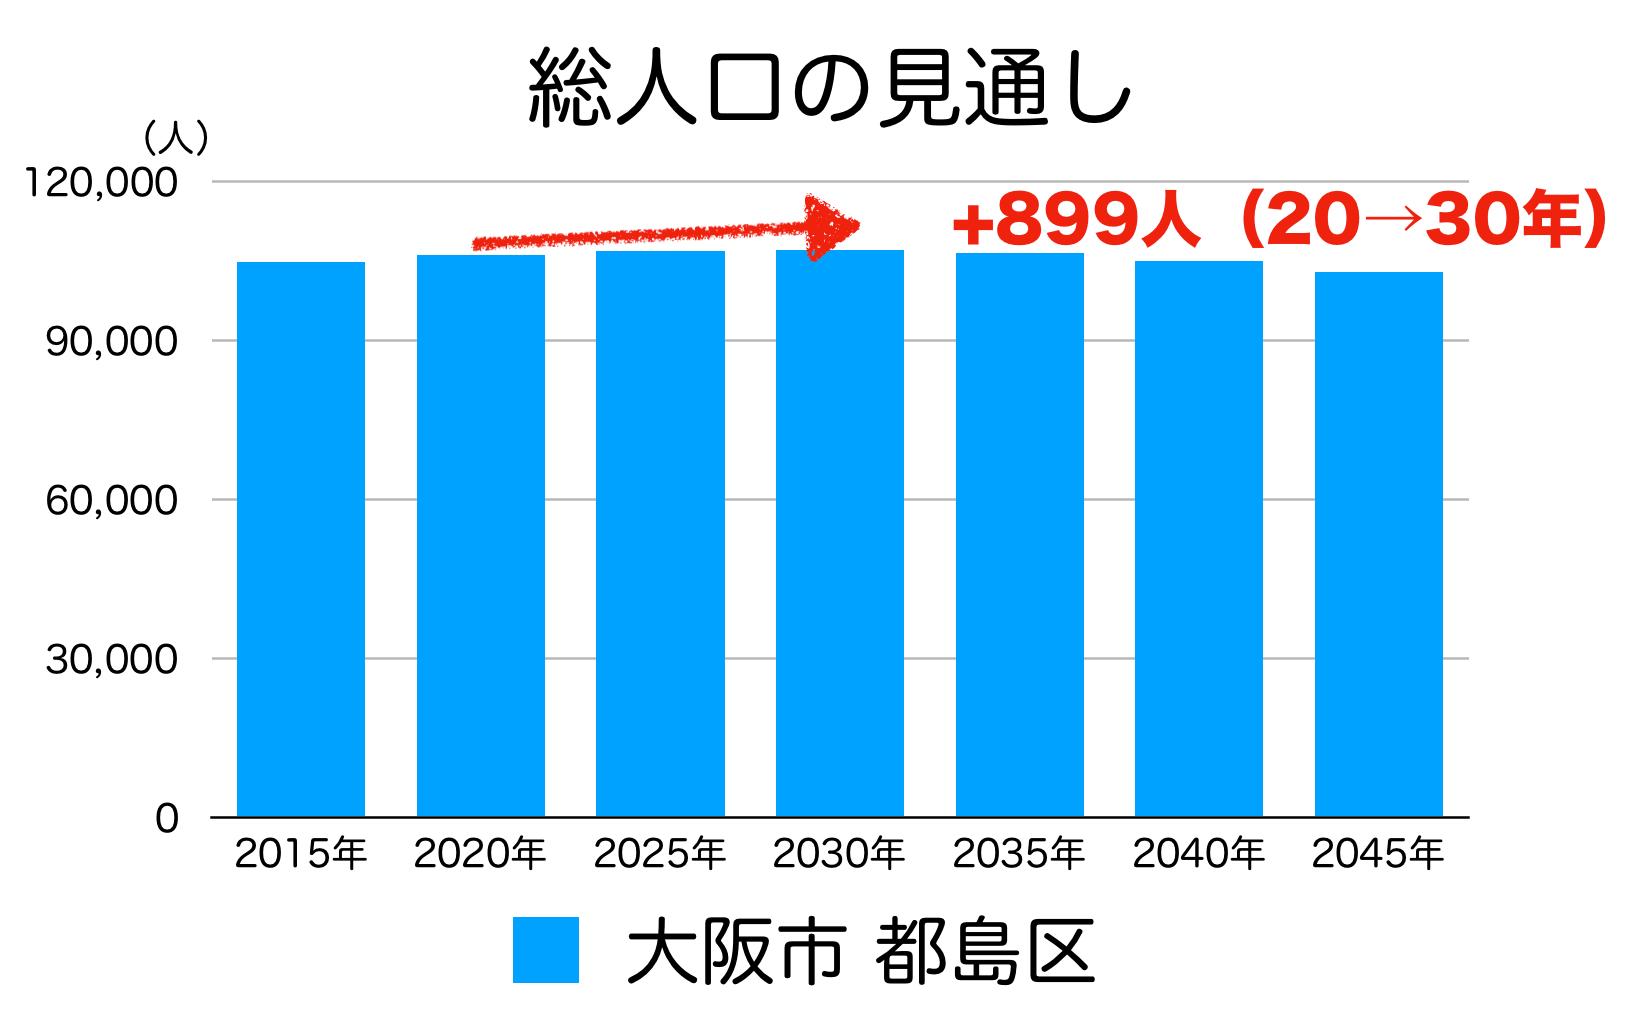 大阪市都島区の人口予測